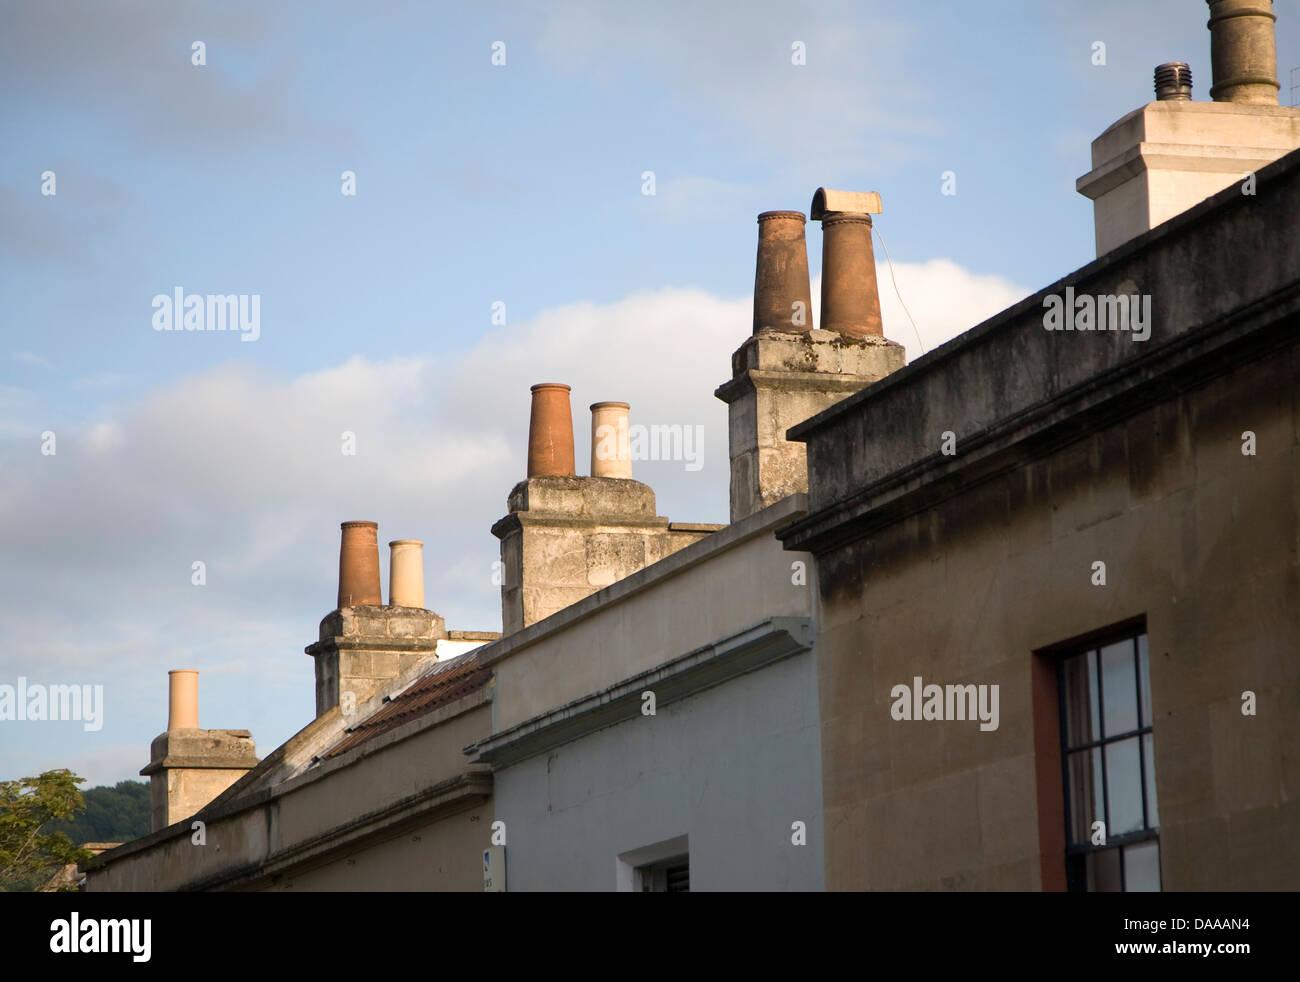 Chimney pots on house roofs Larkhall Bath England - Stock Image